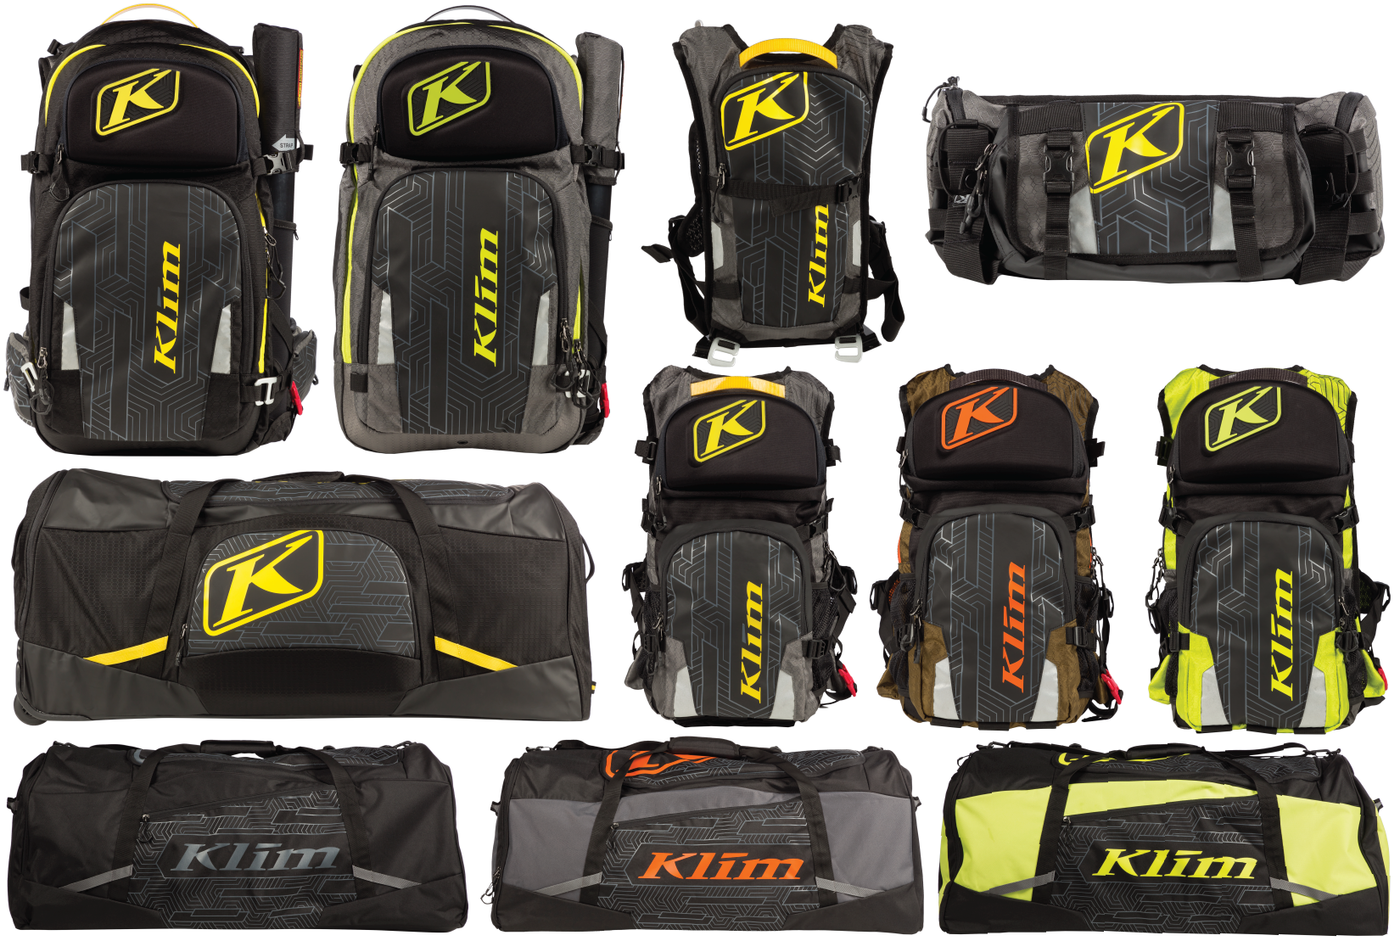 Klim Packs Gear Bags By Joe Christensen At Coroflot